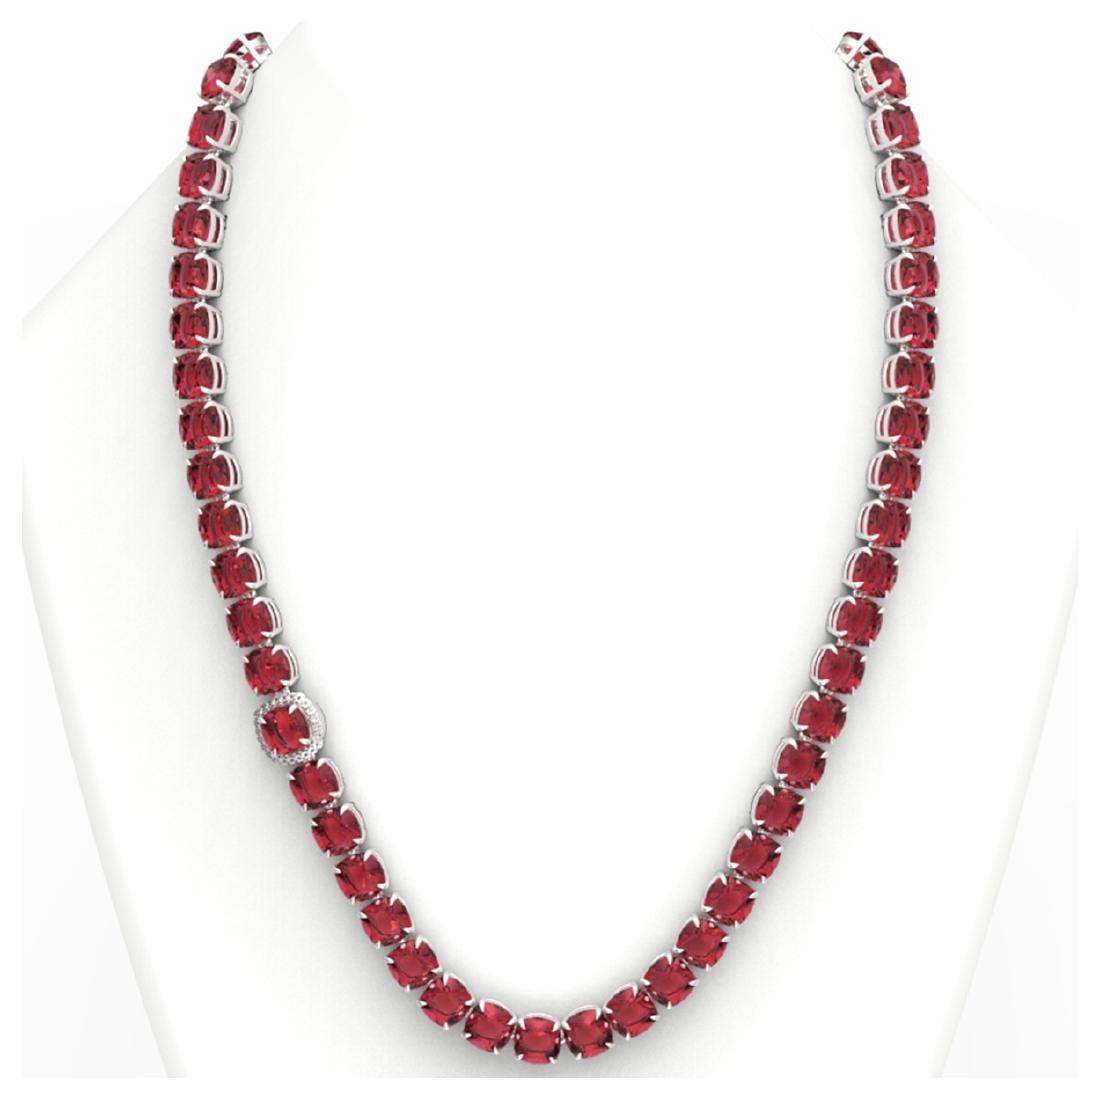 100 ctw Pink Tourmaline & VS/SI Diamond Necklace 14K - 3